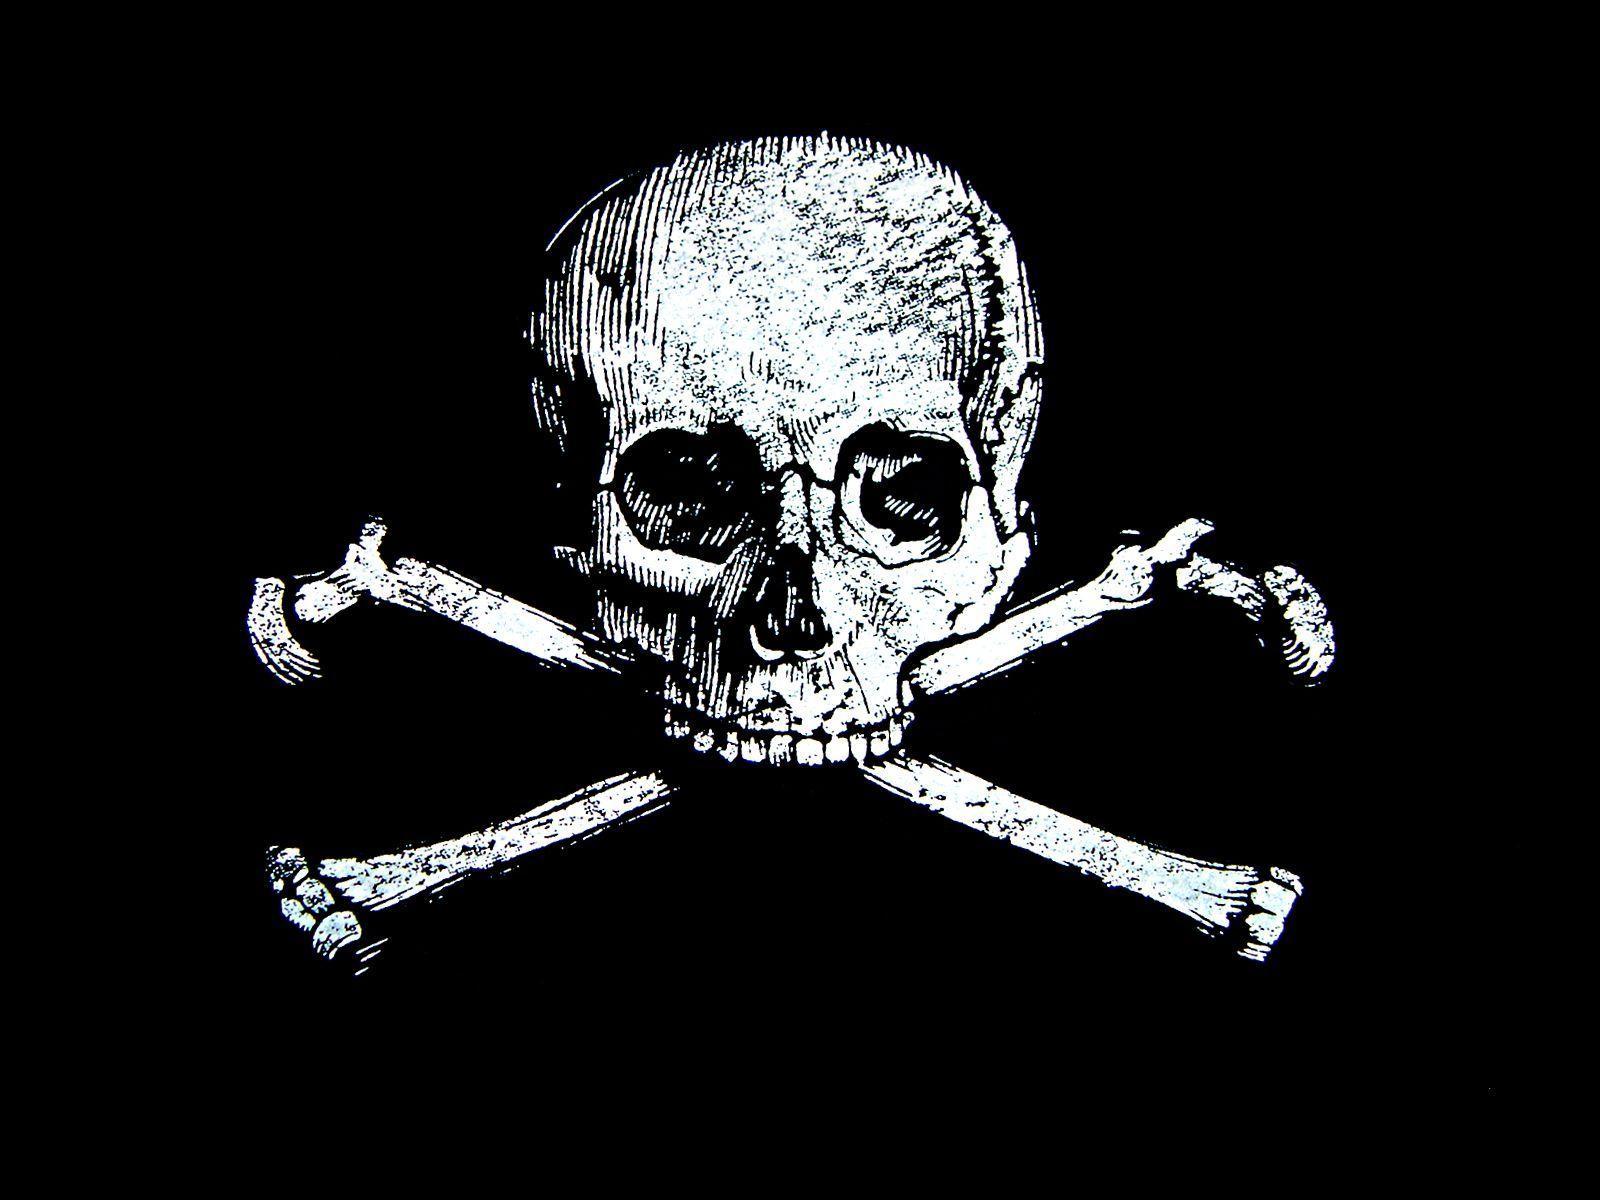 Skull And Crossbones Wallpapers - Wallpaper Cave